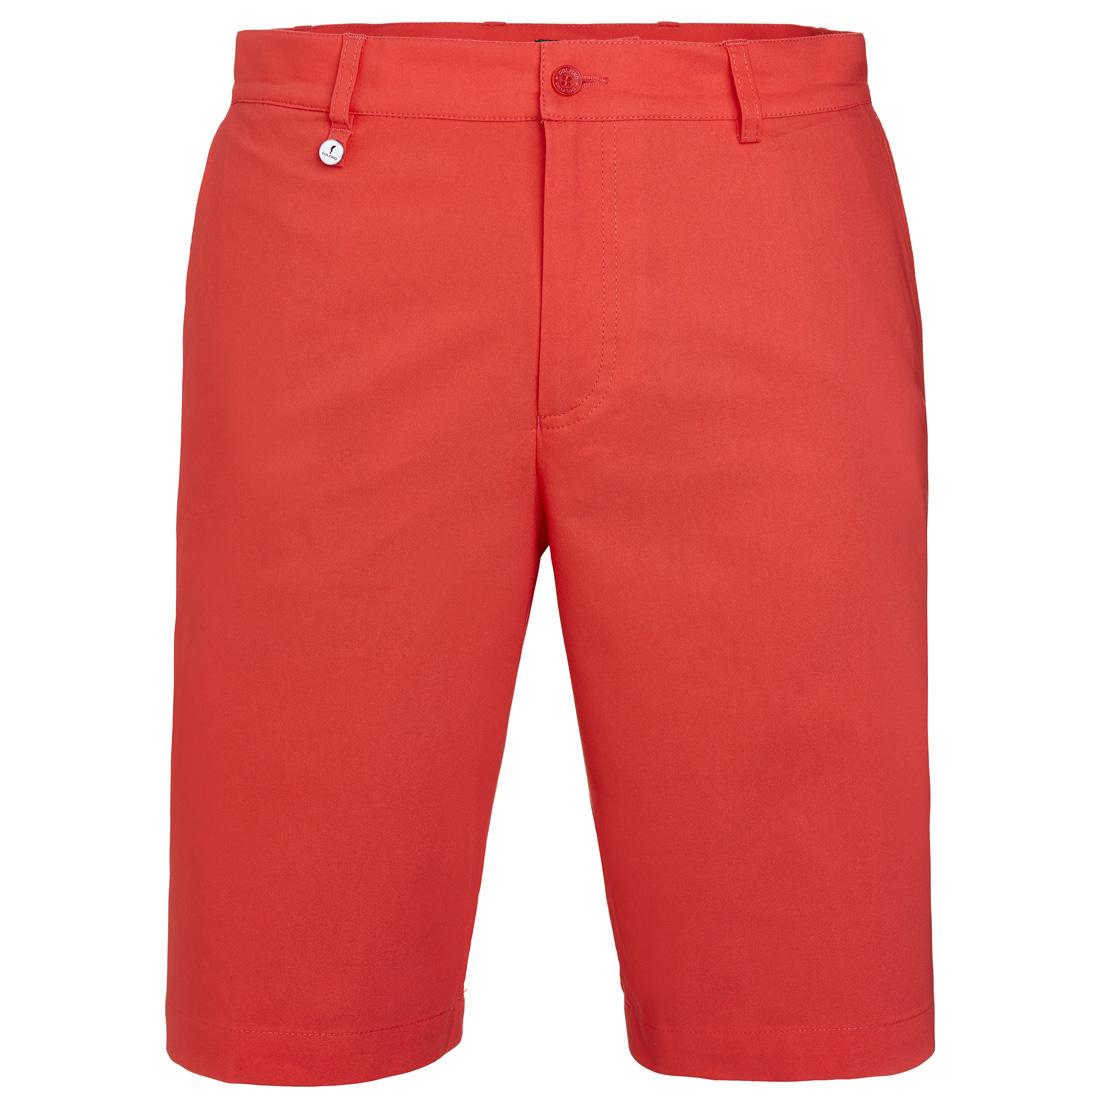 Golf Shorts Techno Stretch Anti-UV in Regular Fit